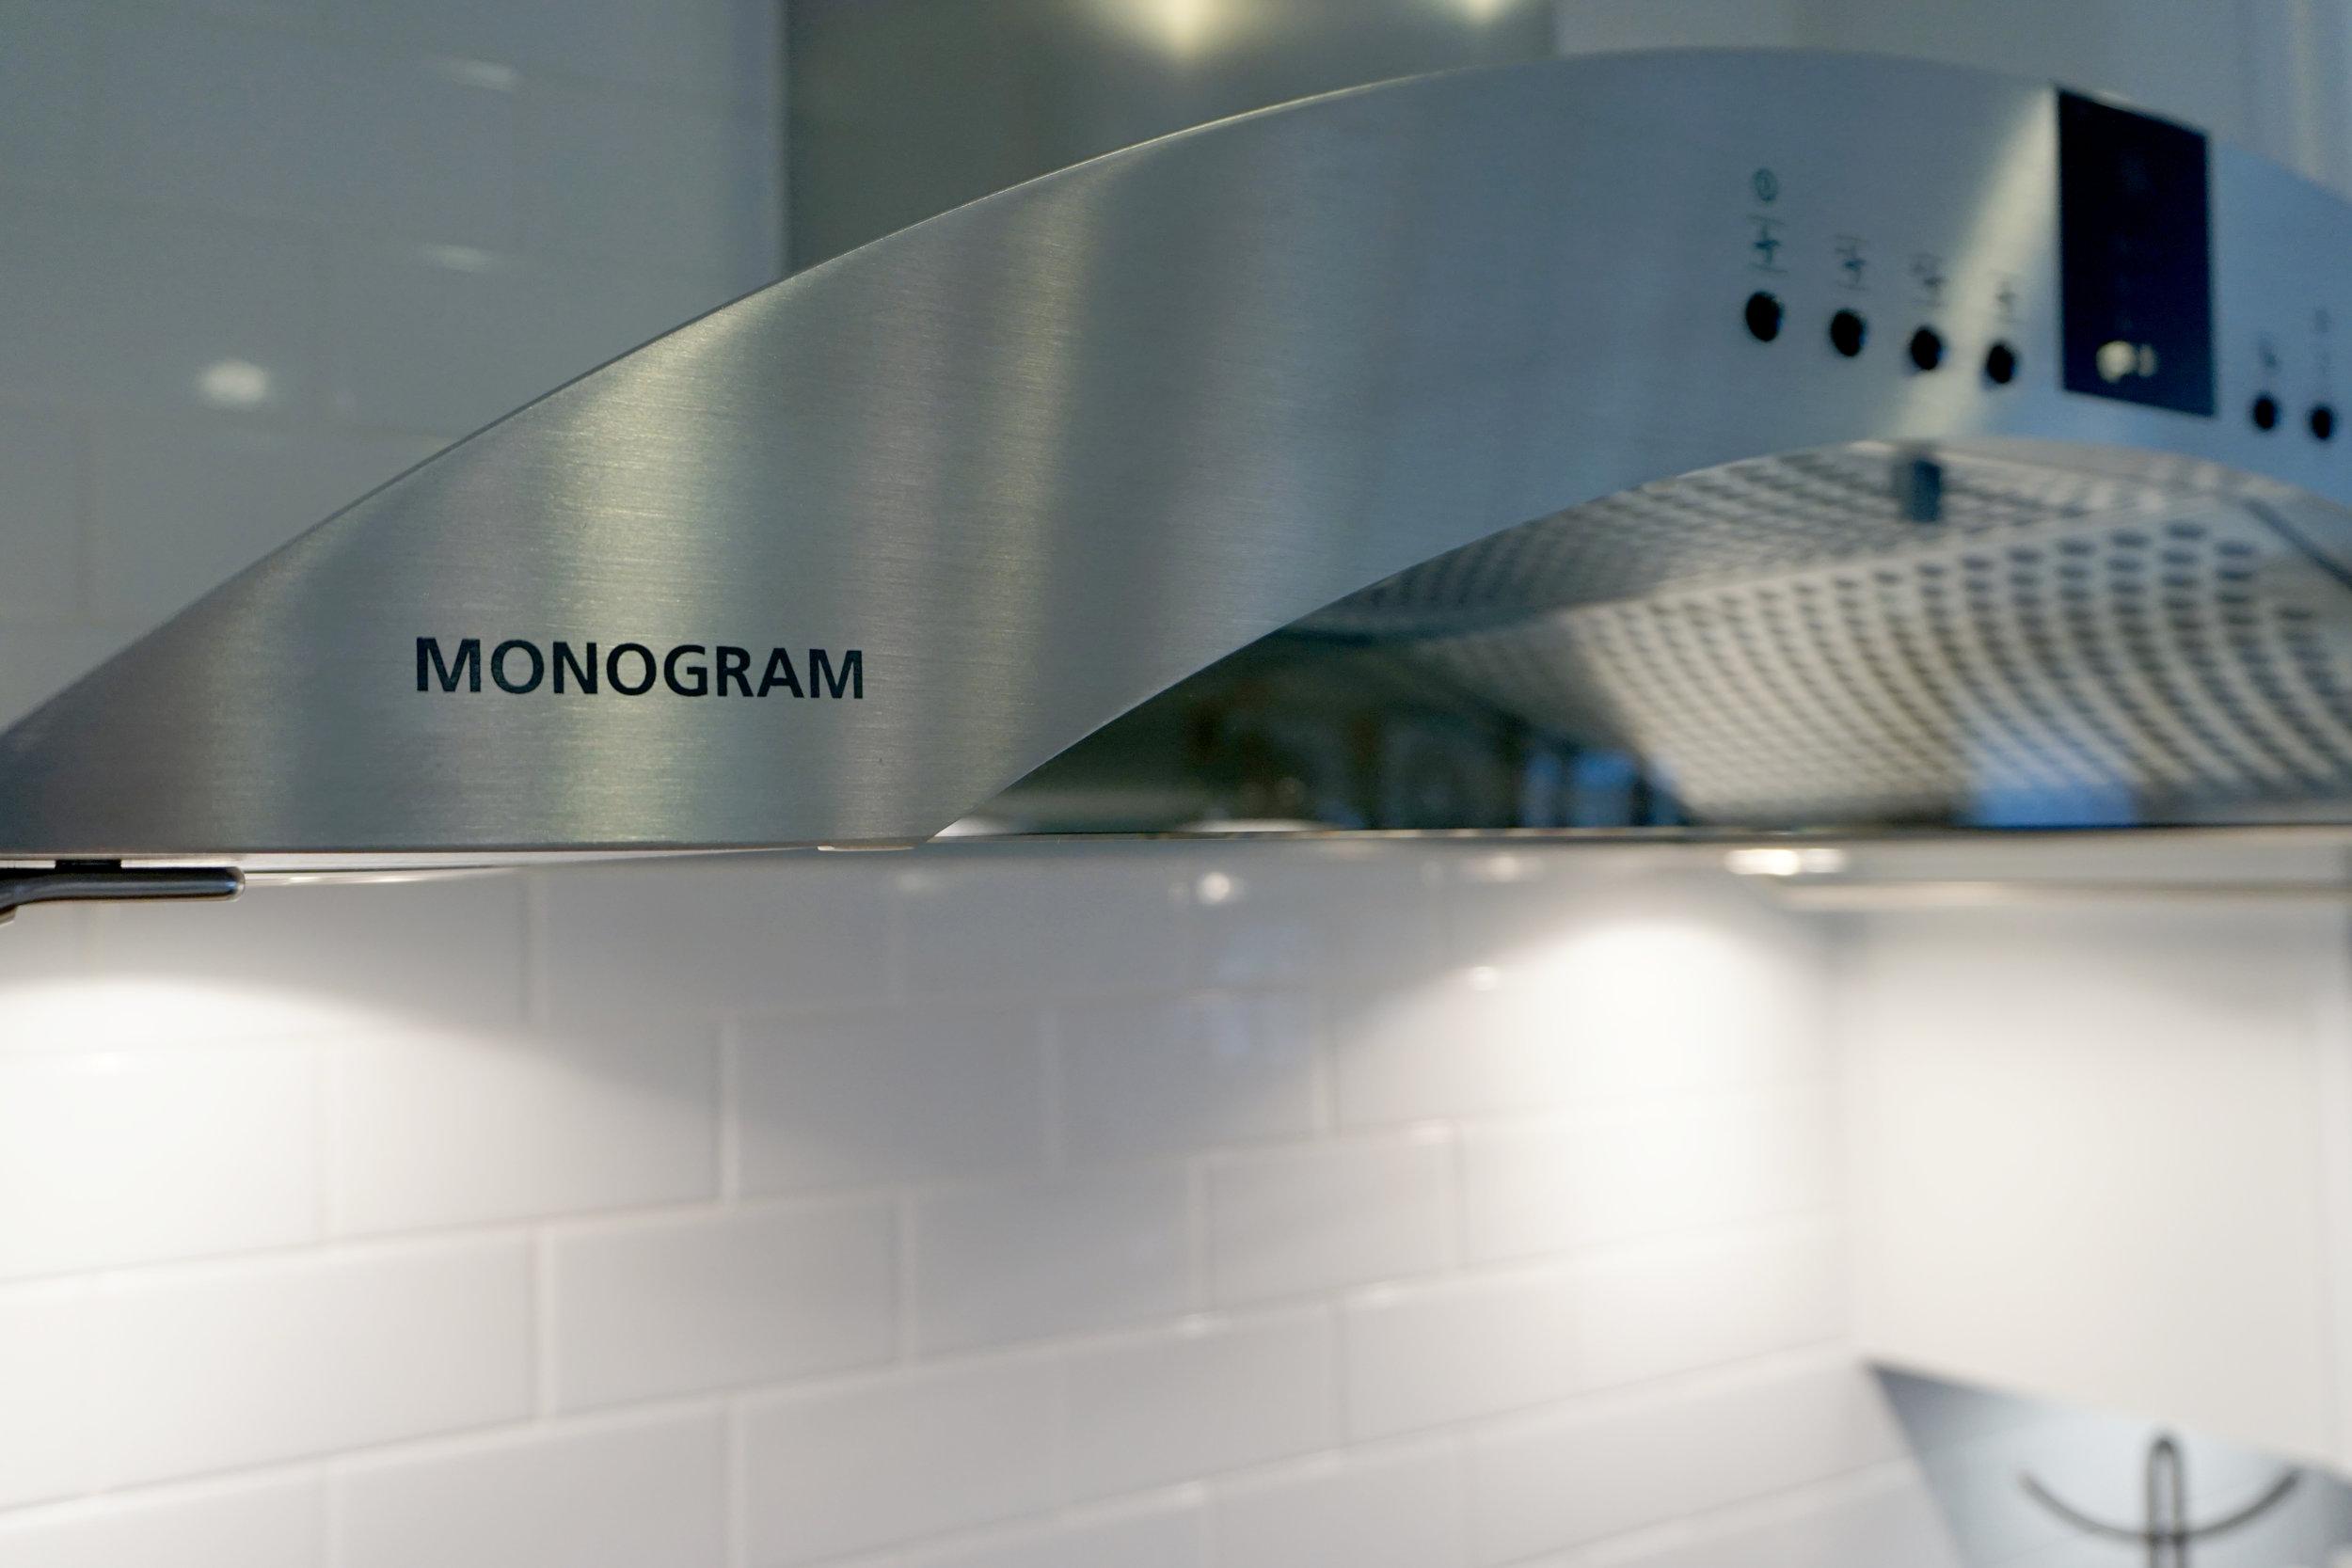 monogram stove.jpg